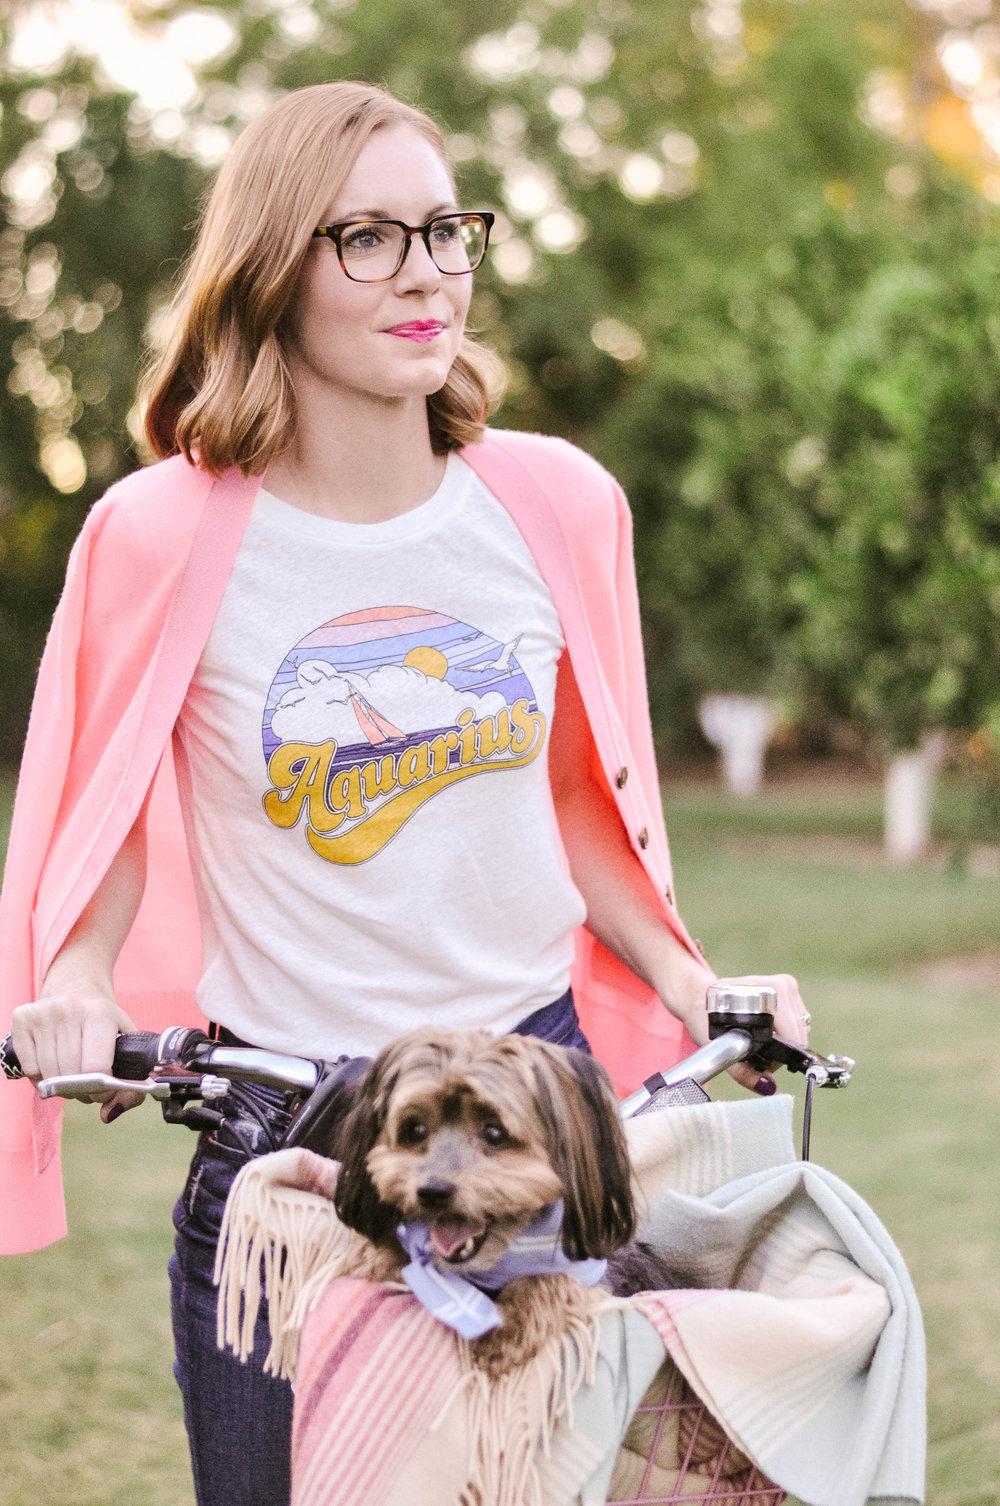 Womens J.Crew Horoscope T-Shirt, Women's J.Crew Harlow Cardigan, Women's J.Crew Boyfriend Jeans